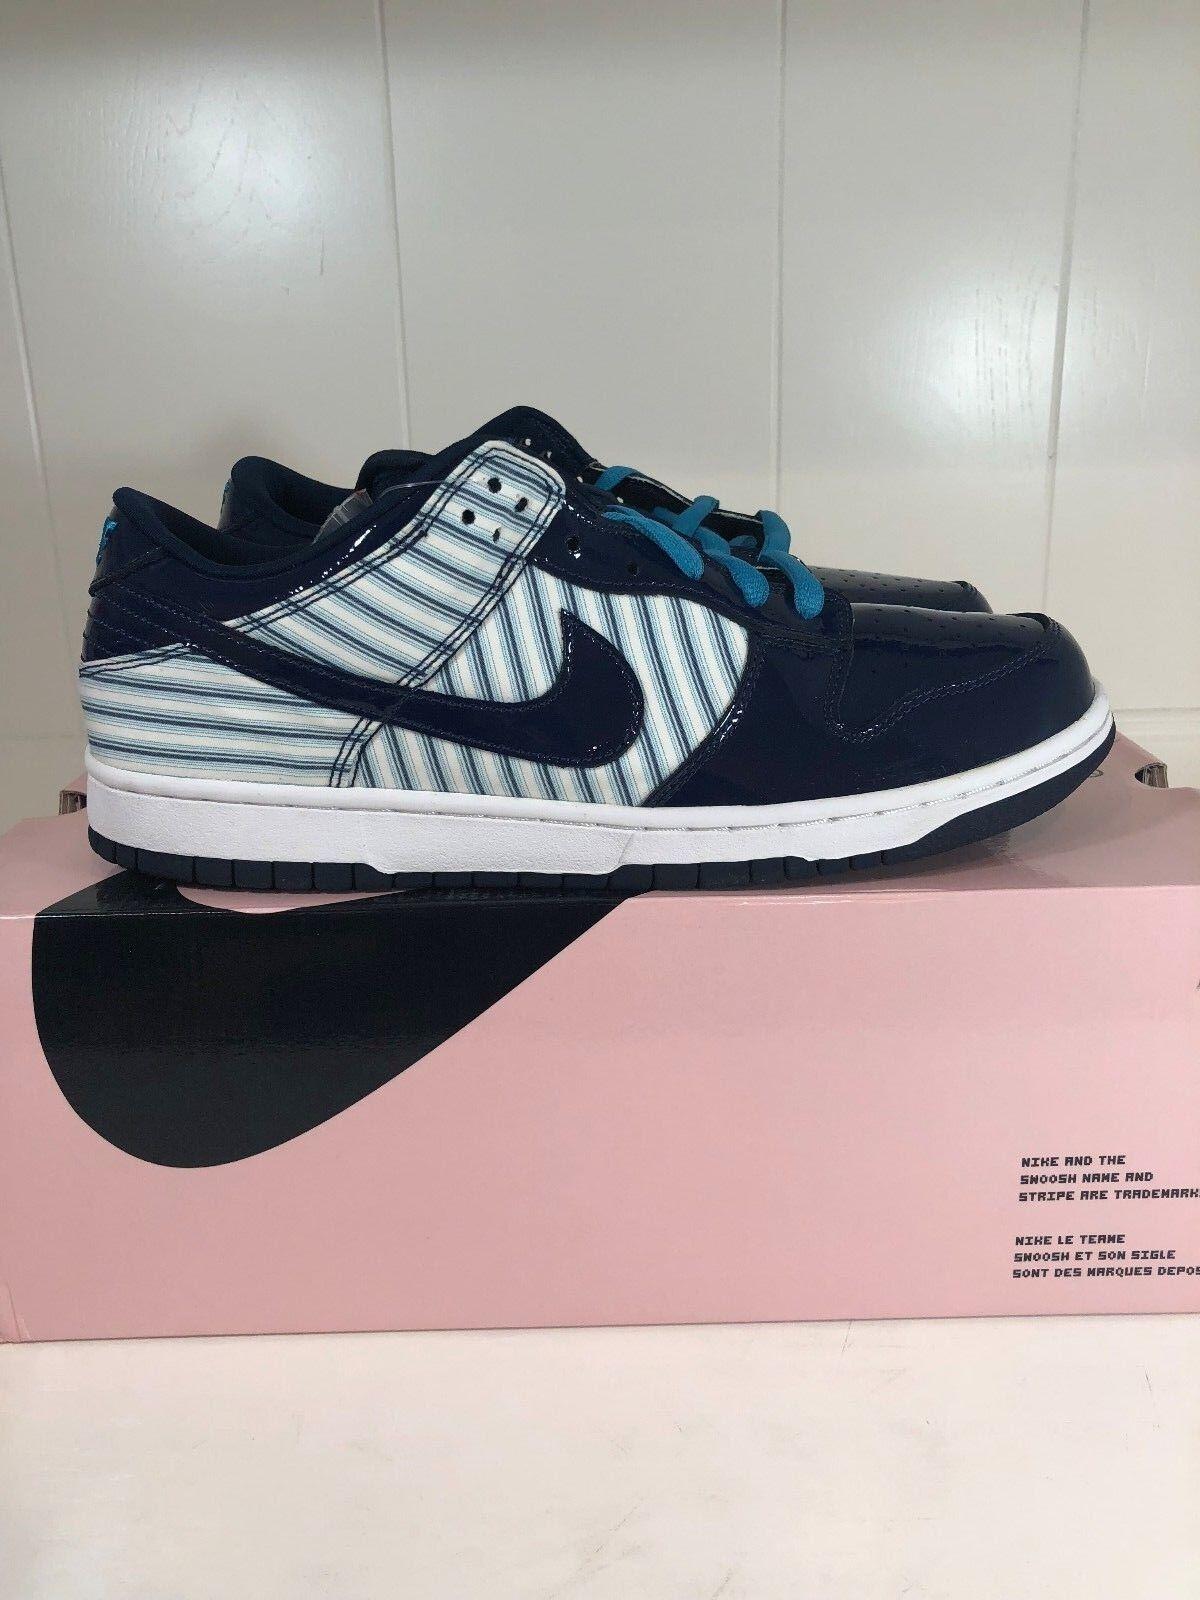 Nike SB Dunk Low bluee Avenger PL denim supreme pigeon freddy cement 11.5